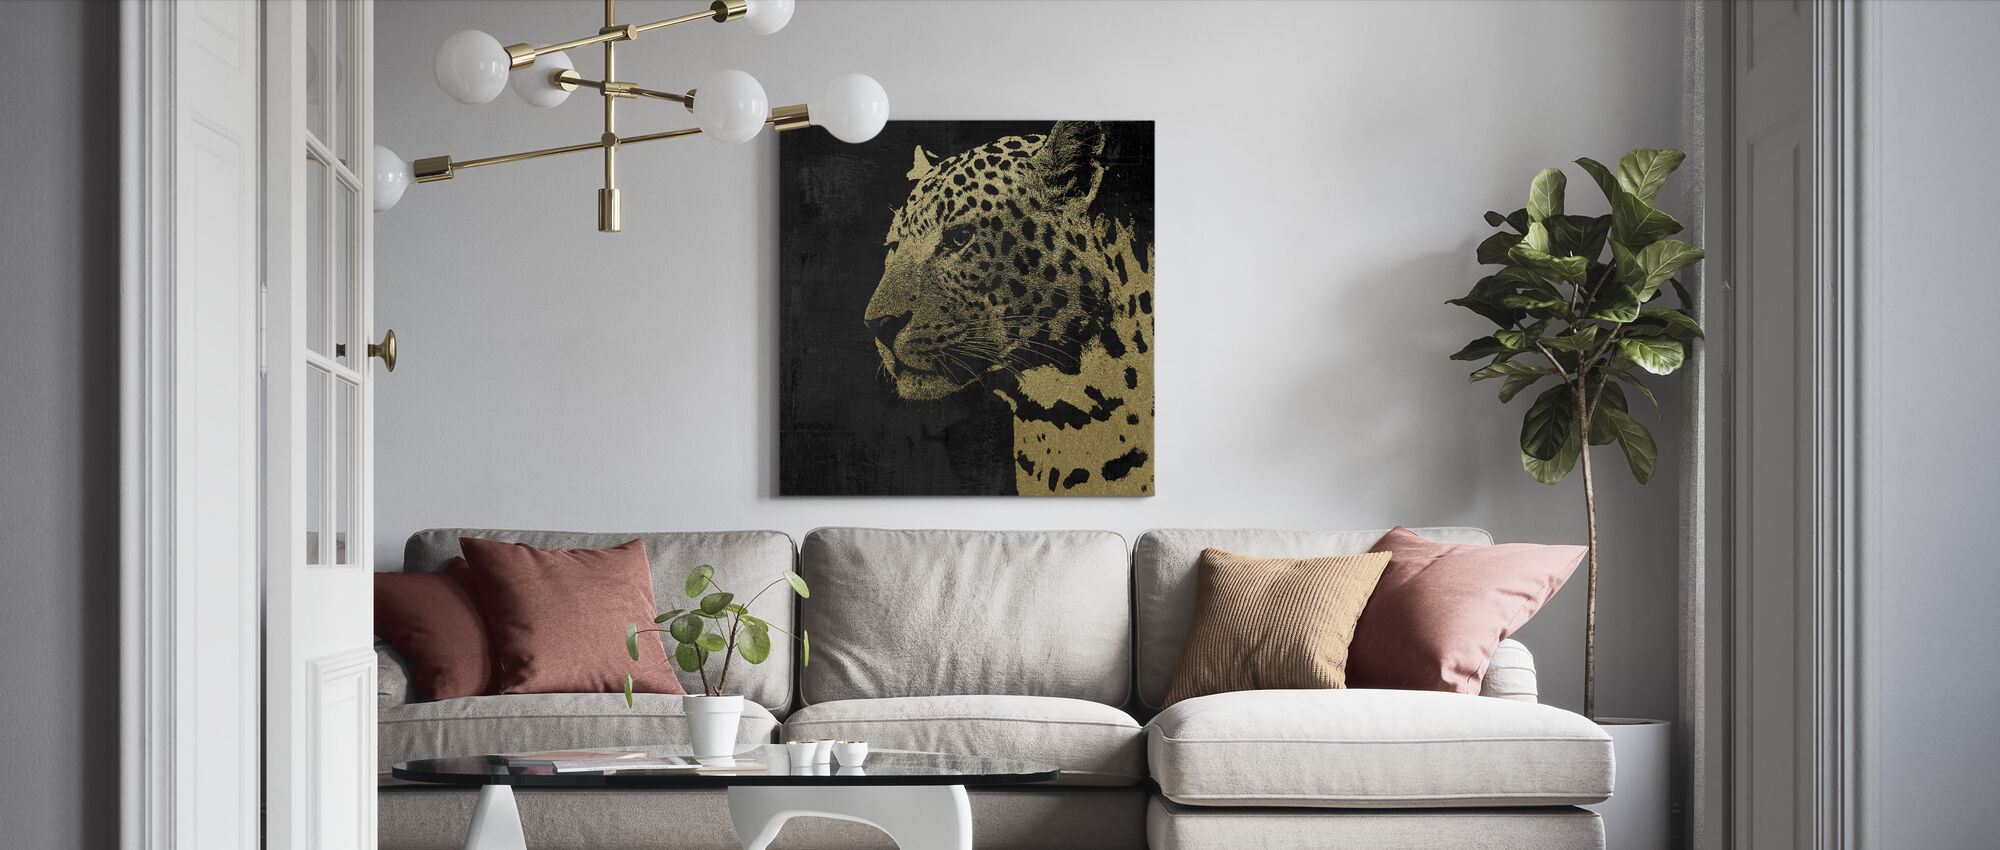 Gouden Luipaard - Canvas print - Woonkamer